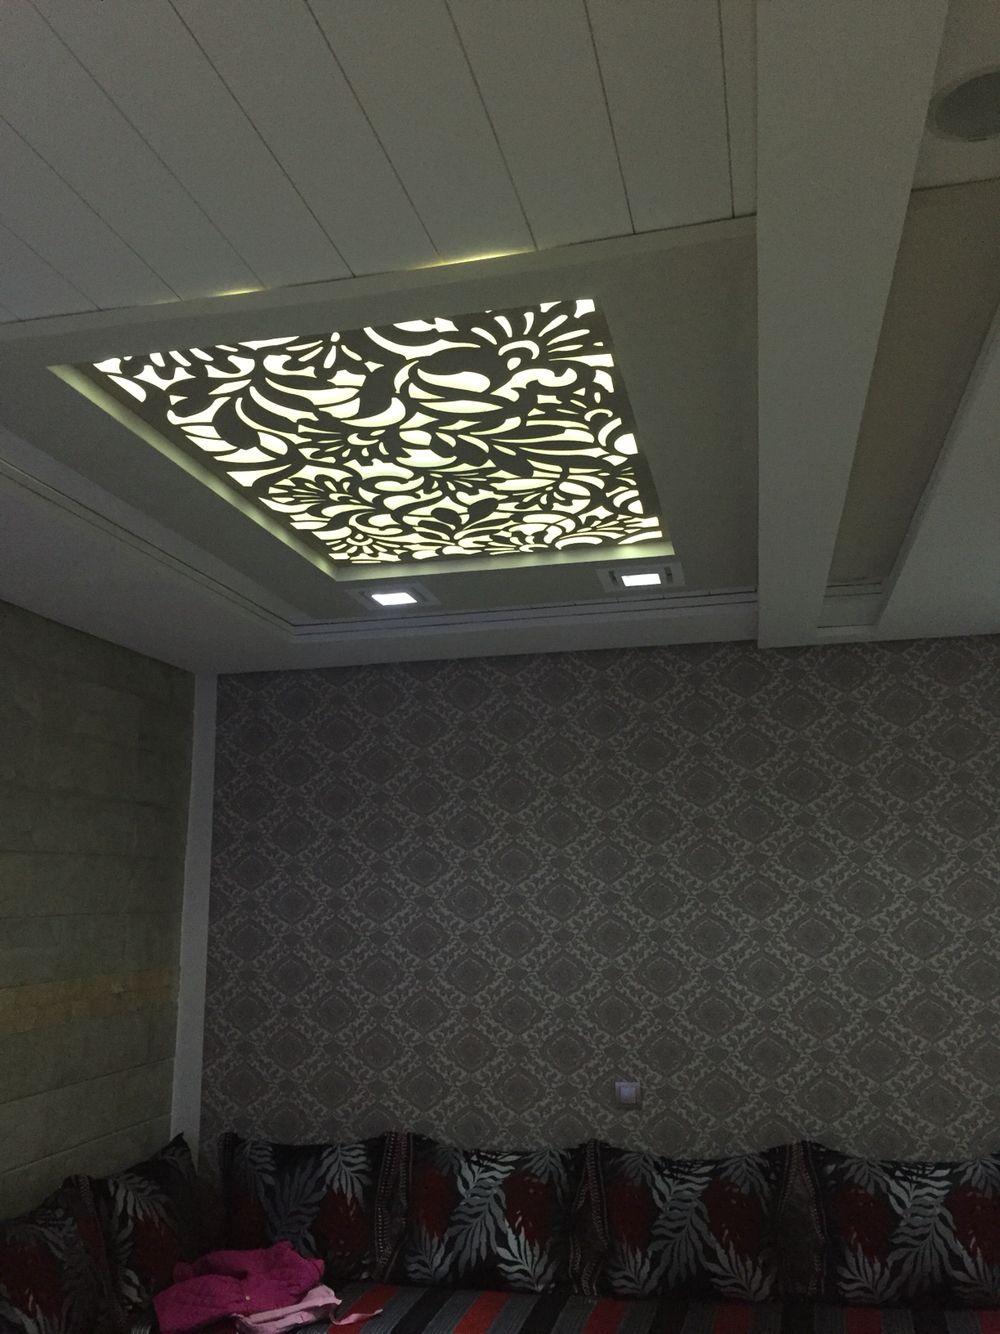 Prodigio oujda maroc cnc patterns pinterest ceilings - False wall designs in living room ...